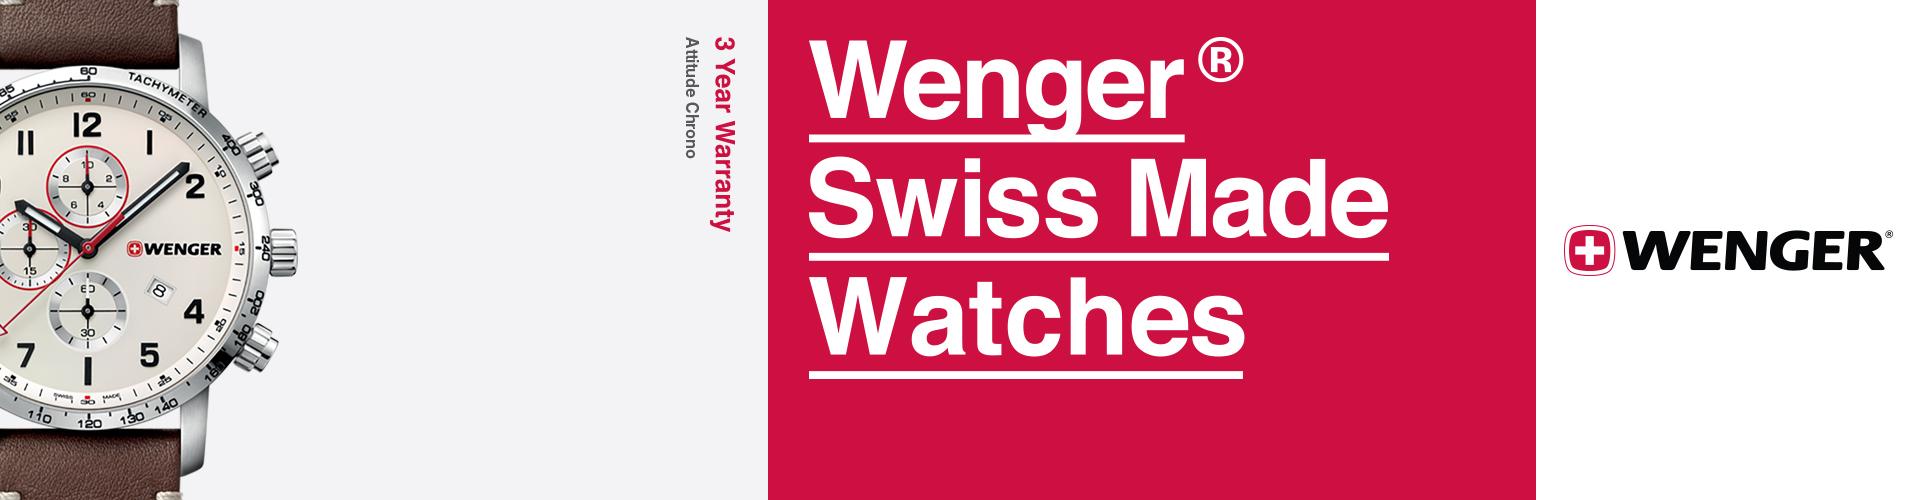 Wenger Блок 2